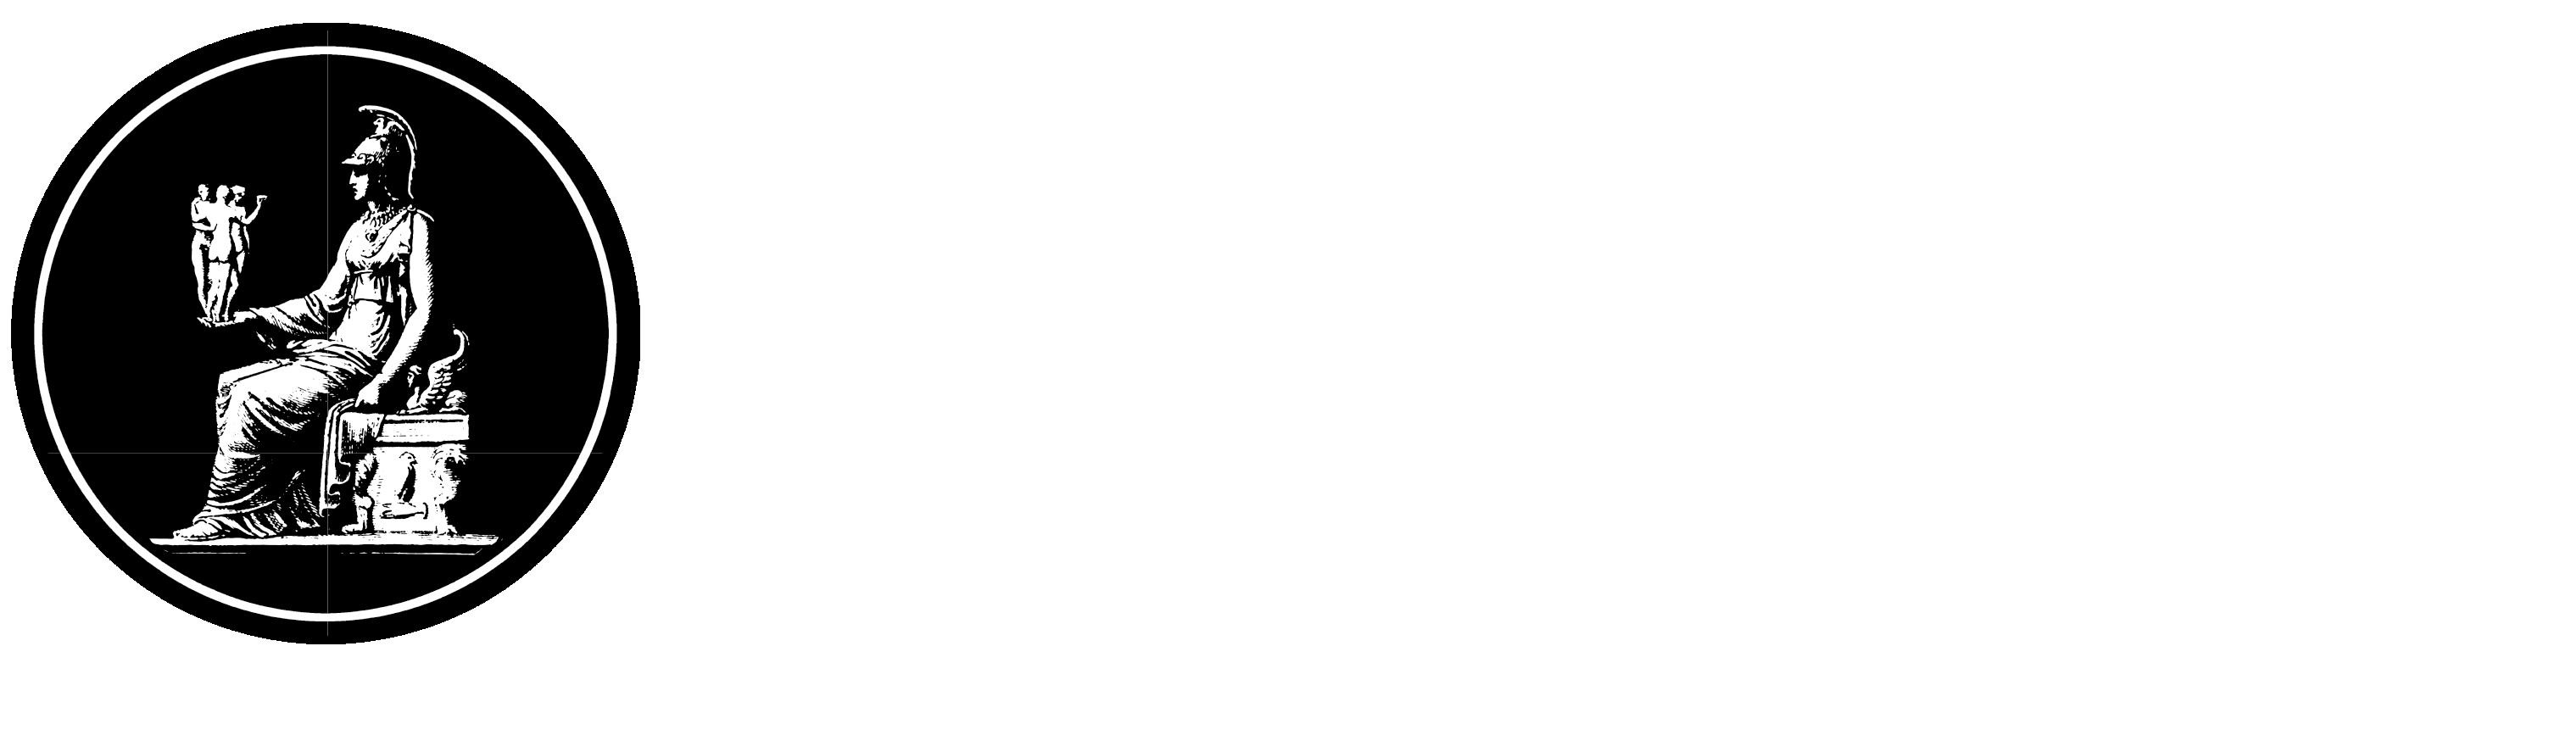 Esami di Ammissione | Accademia di Brera